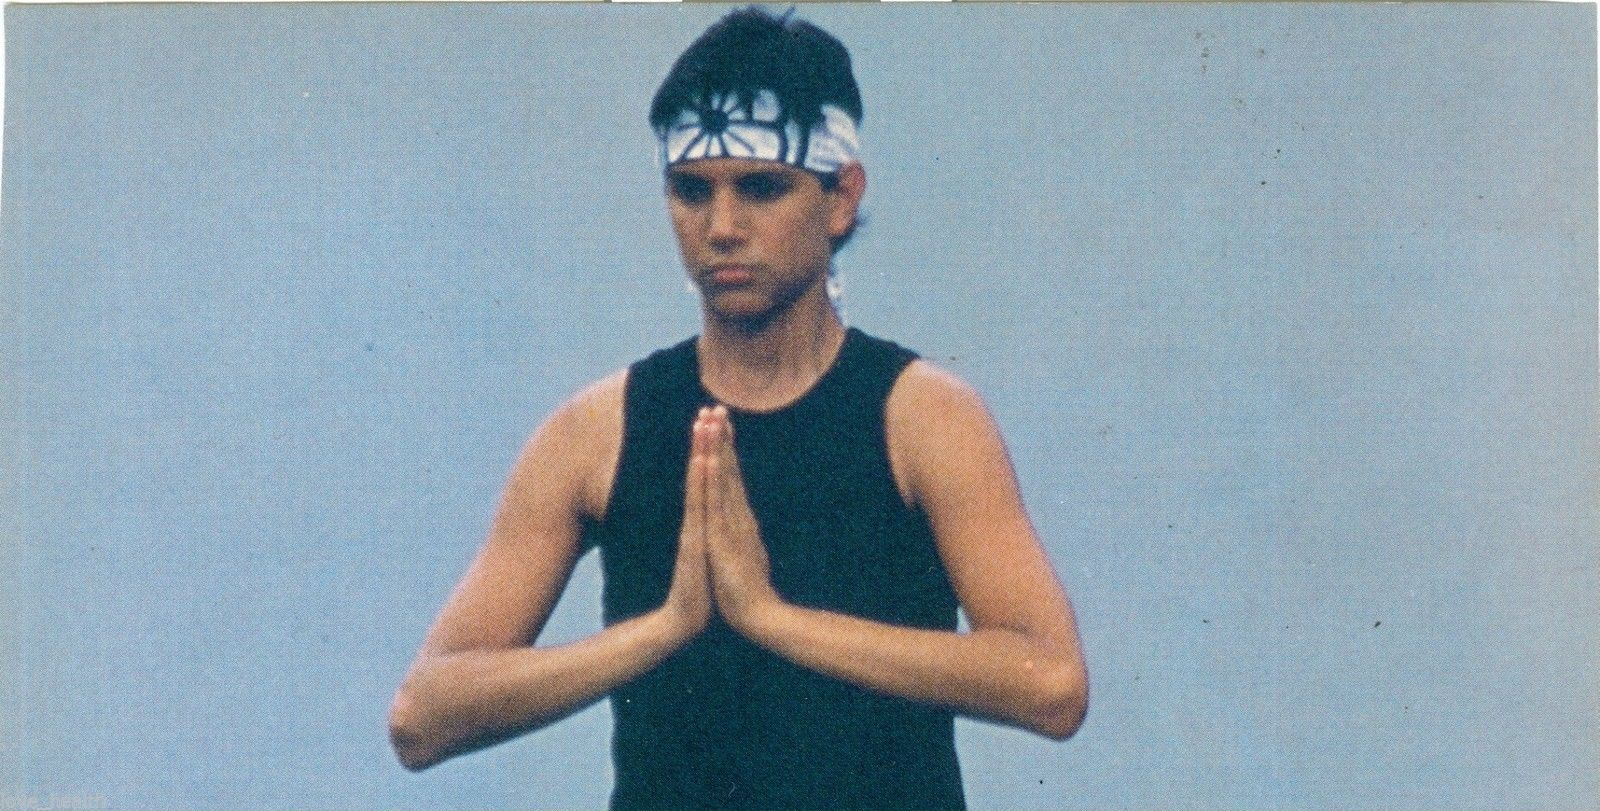 Lovehealth Ralph Macchio Barefoot John Stamos Teen Boy Actor